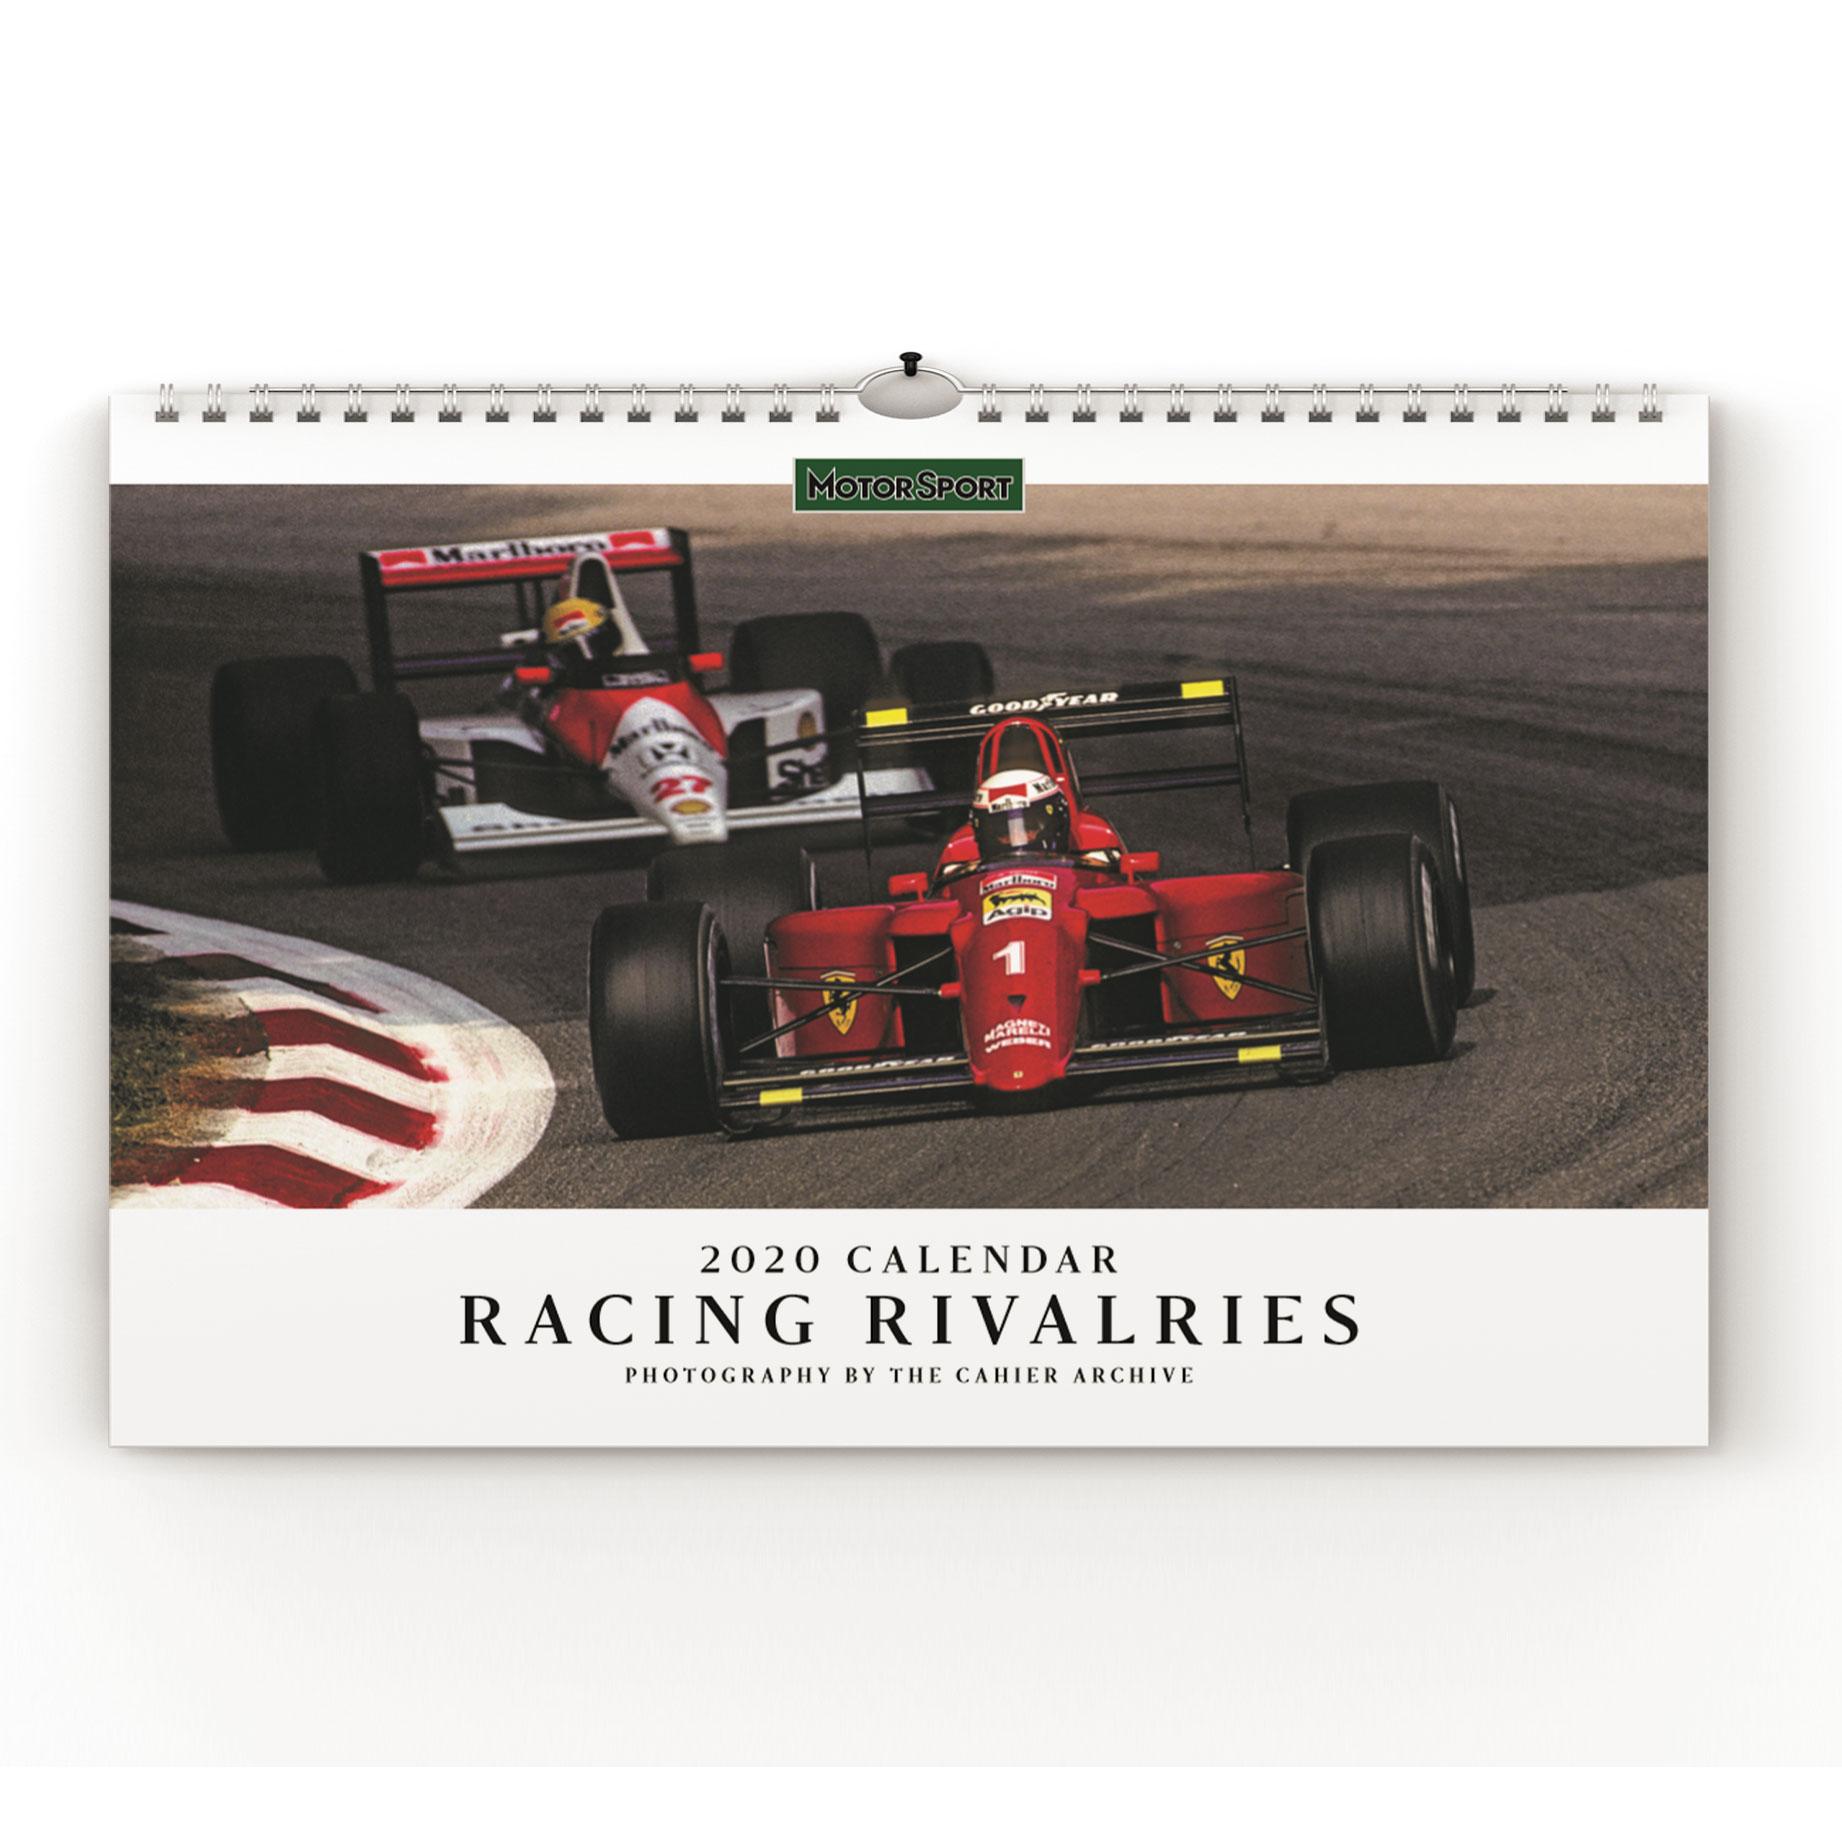 Product image for Motor Sport Calendar 2020 - Racing Rivalries